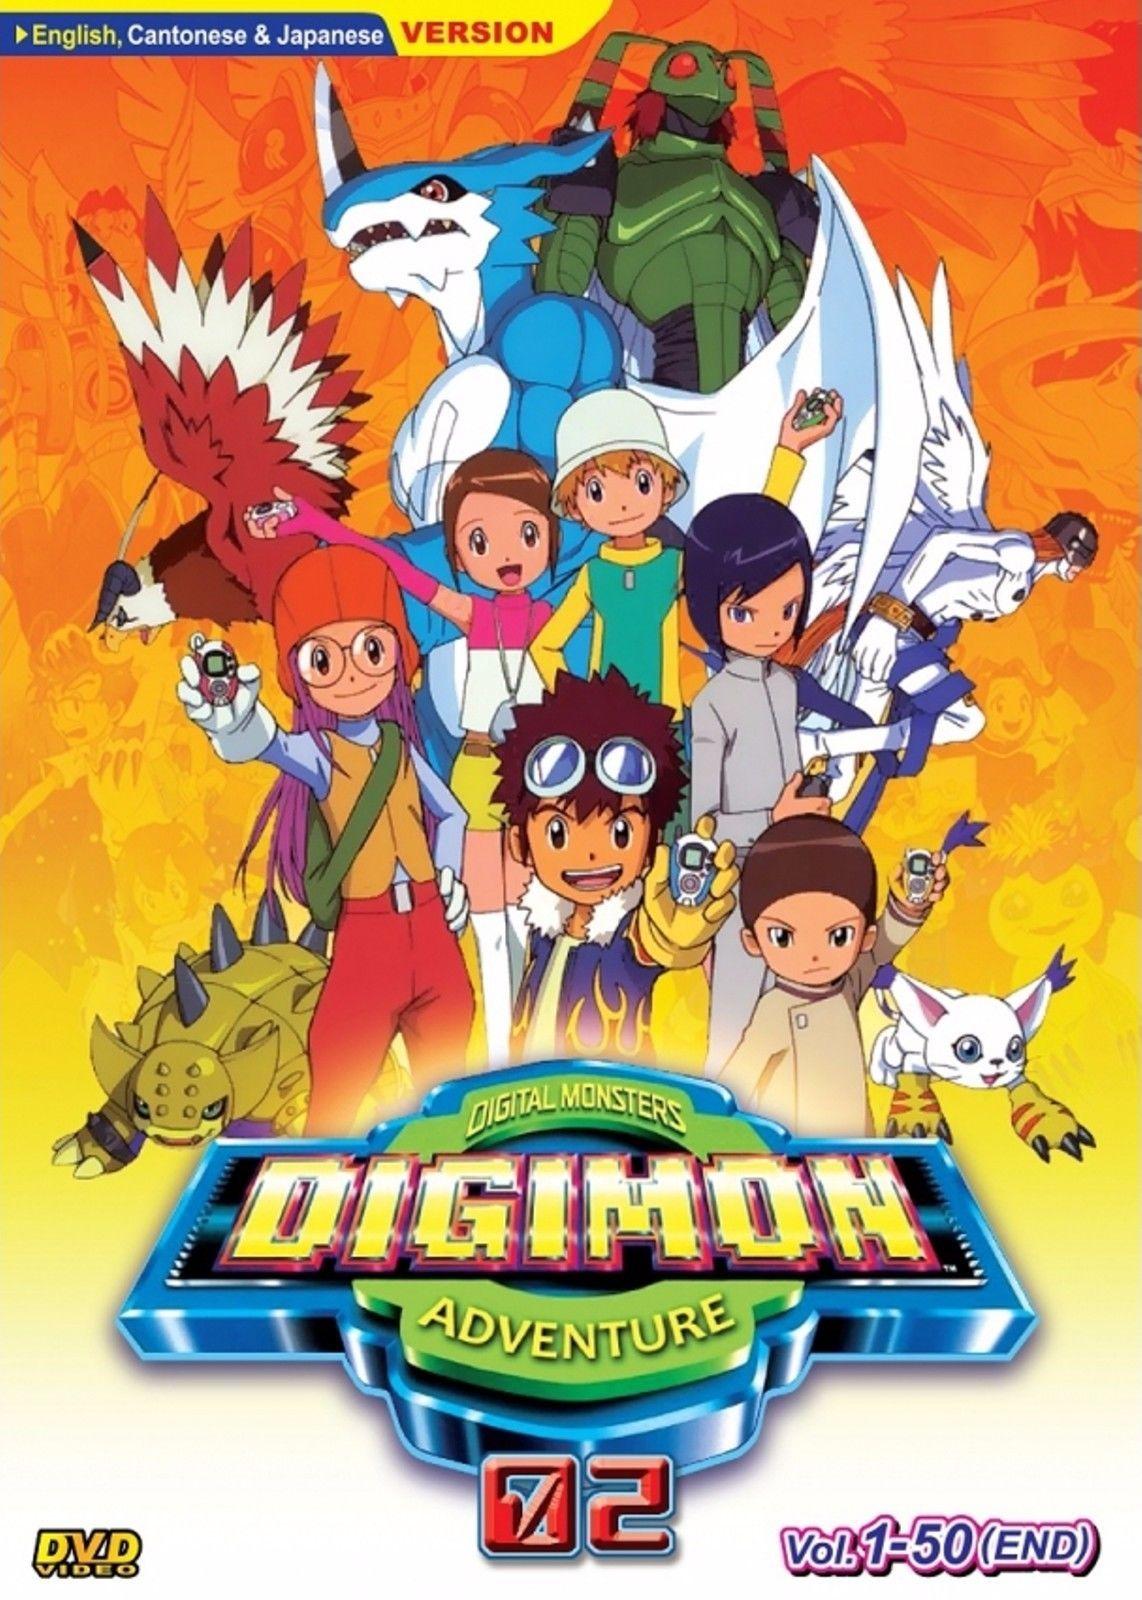 Anime DVD DIGIMON ADVENTURE 02 VOL.150 END Japan